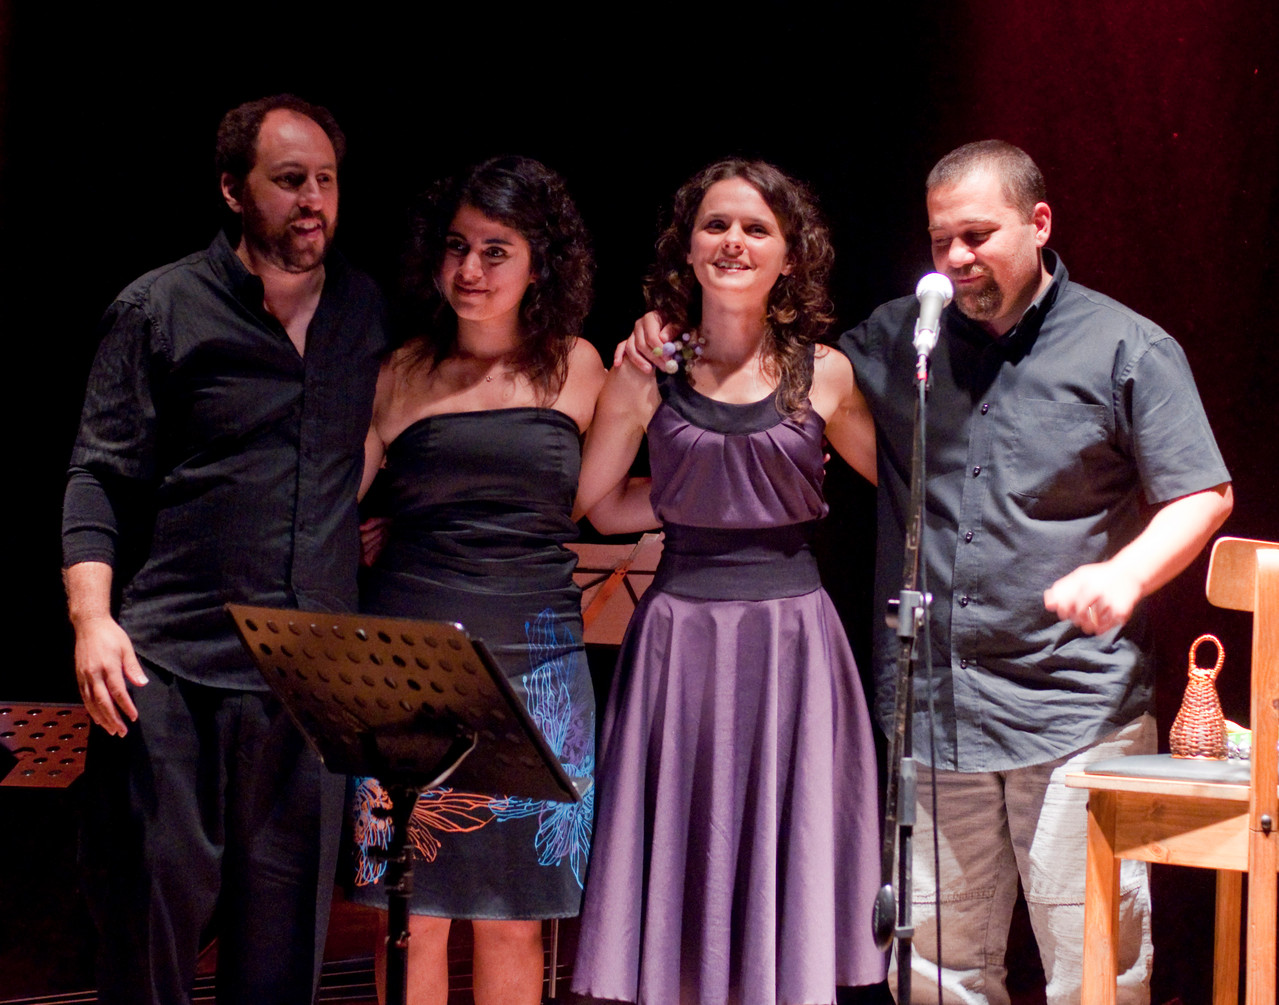 Con Carolina Valcarcel, Carolina Cajal y Leandro Savelón